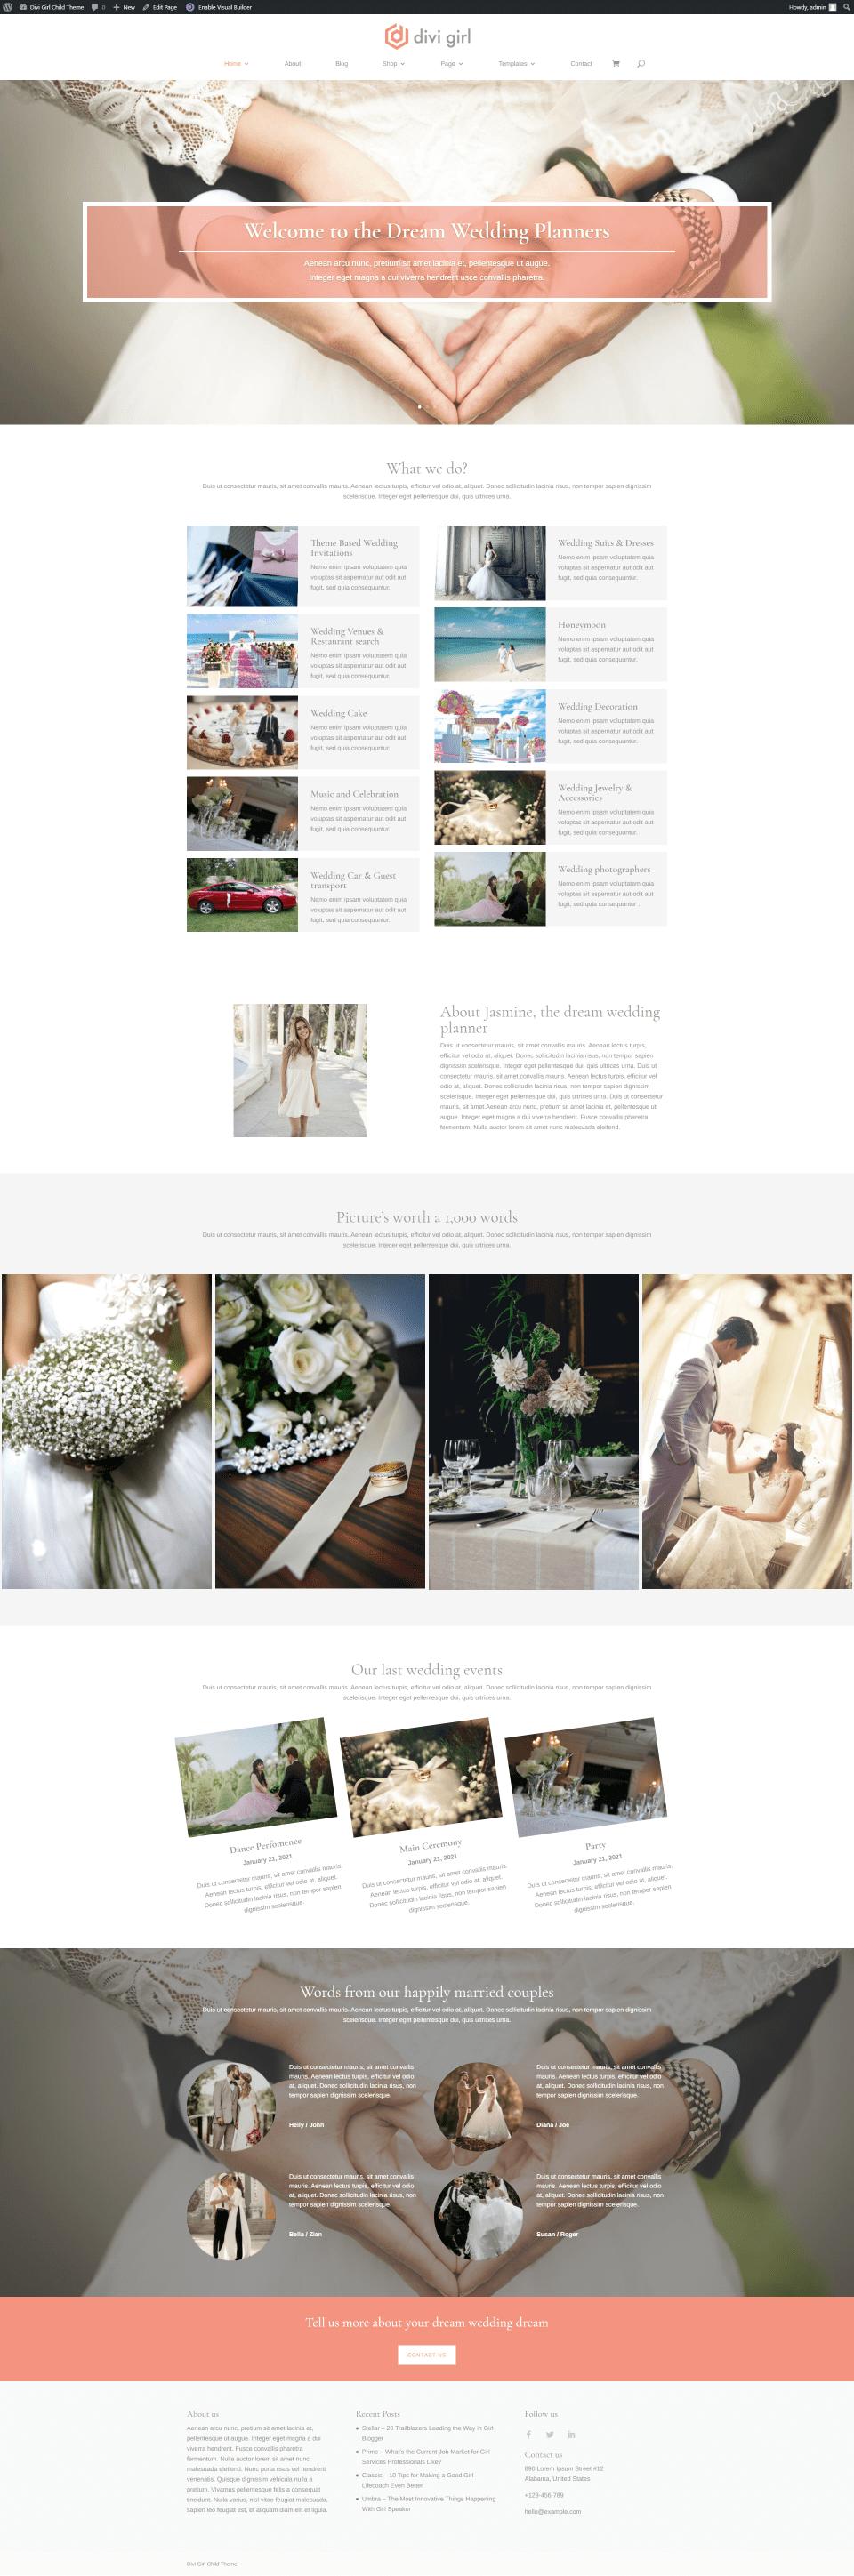 Wedding Planner Homepage